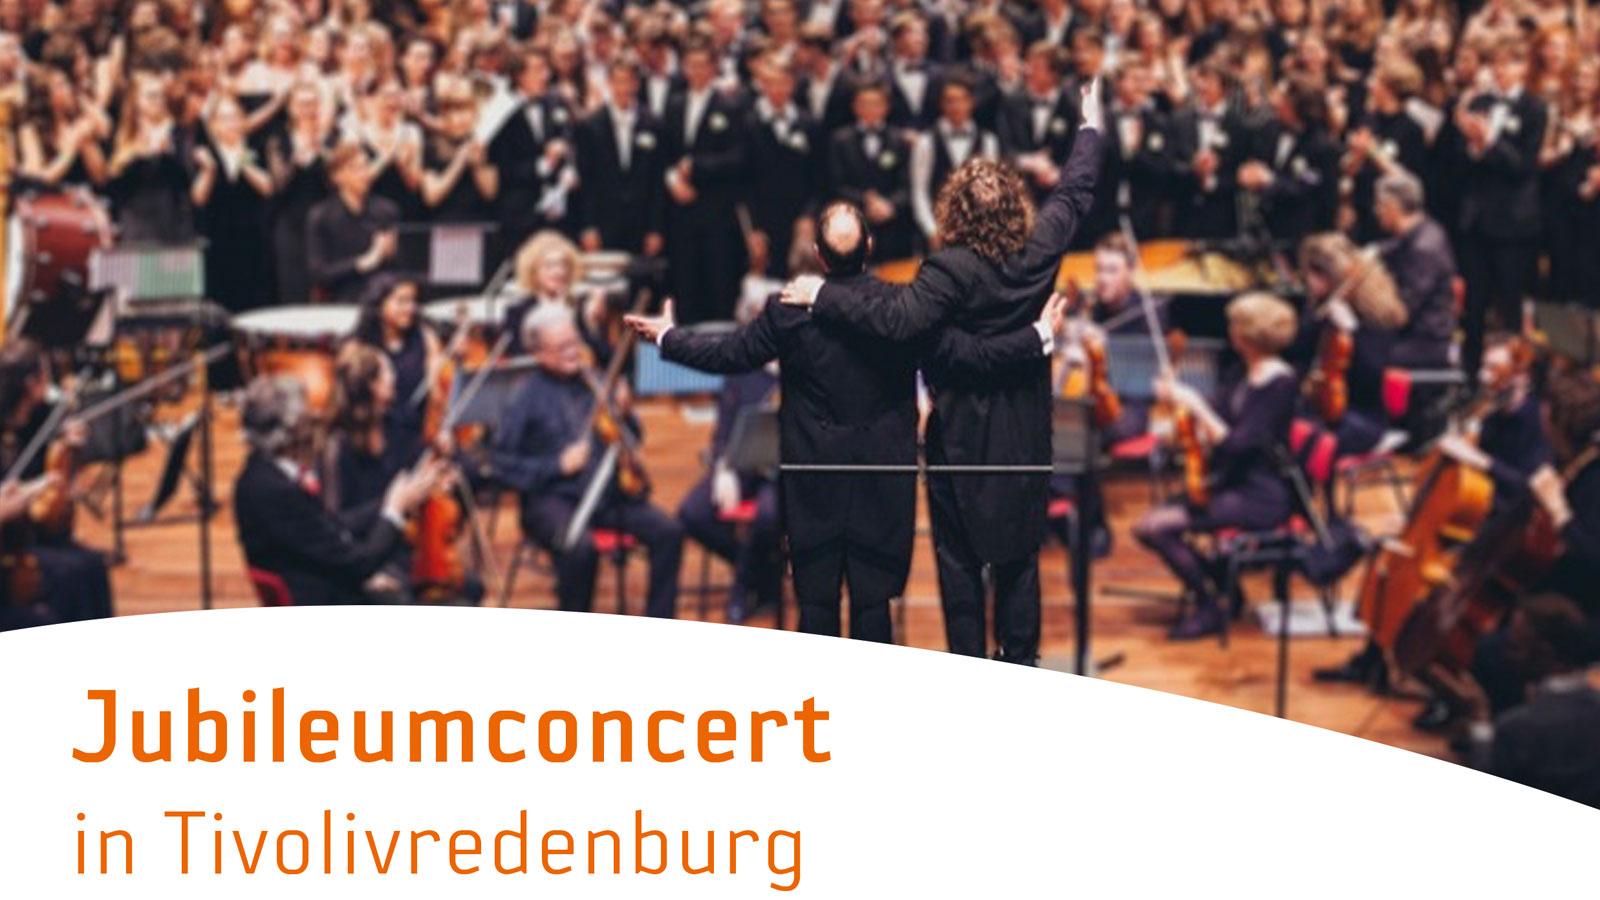 Jubileumconcert in Tivolivredenburg